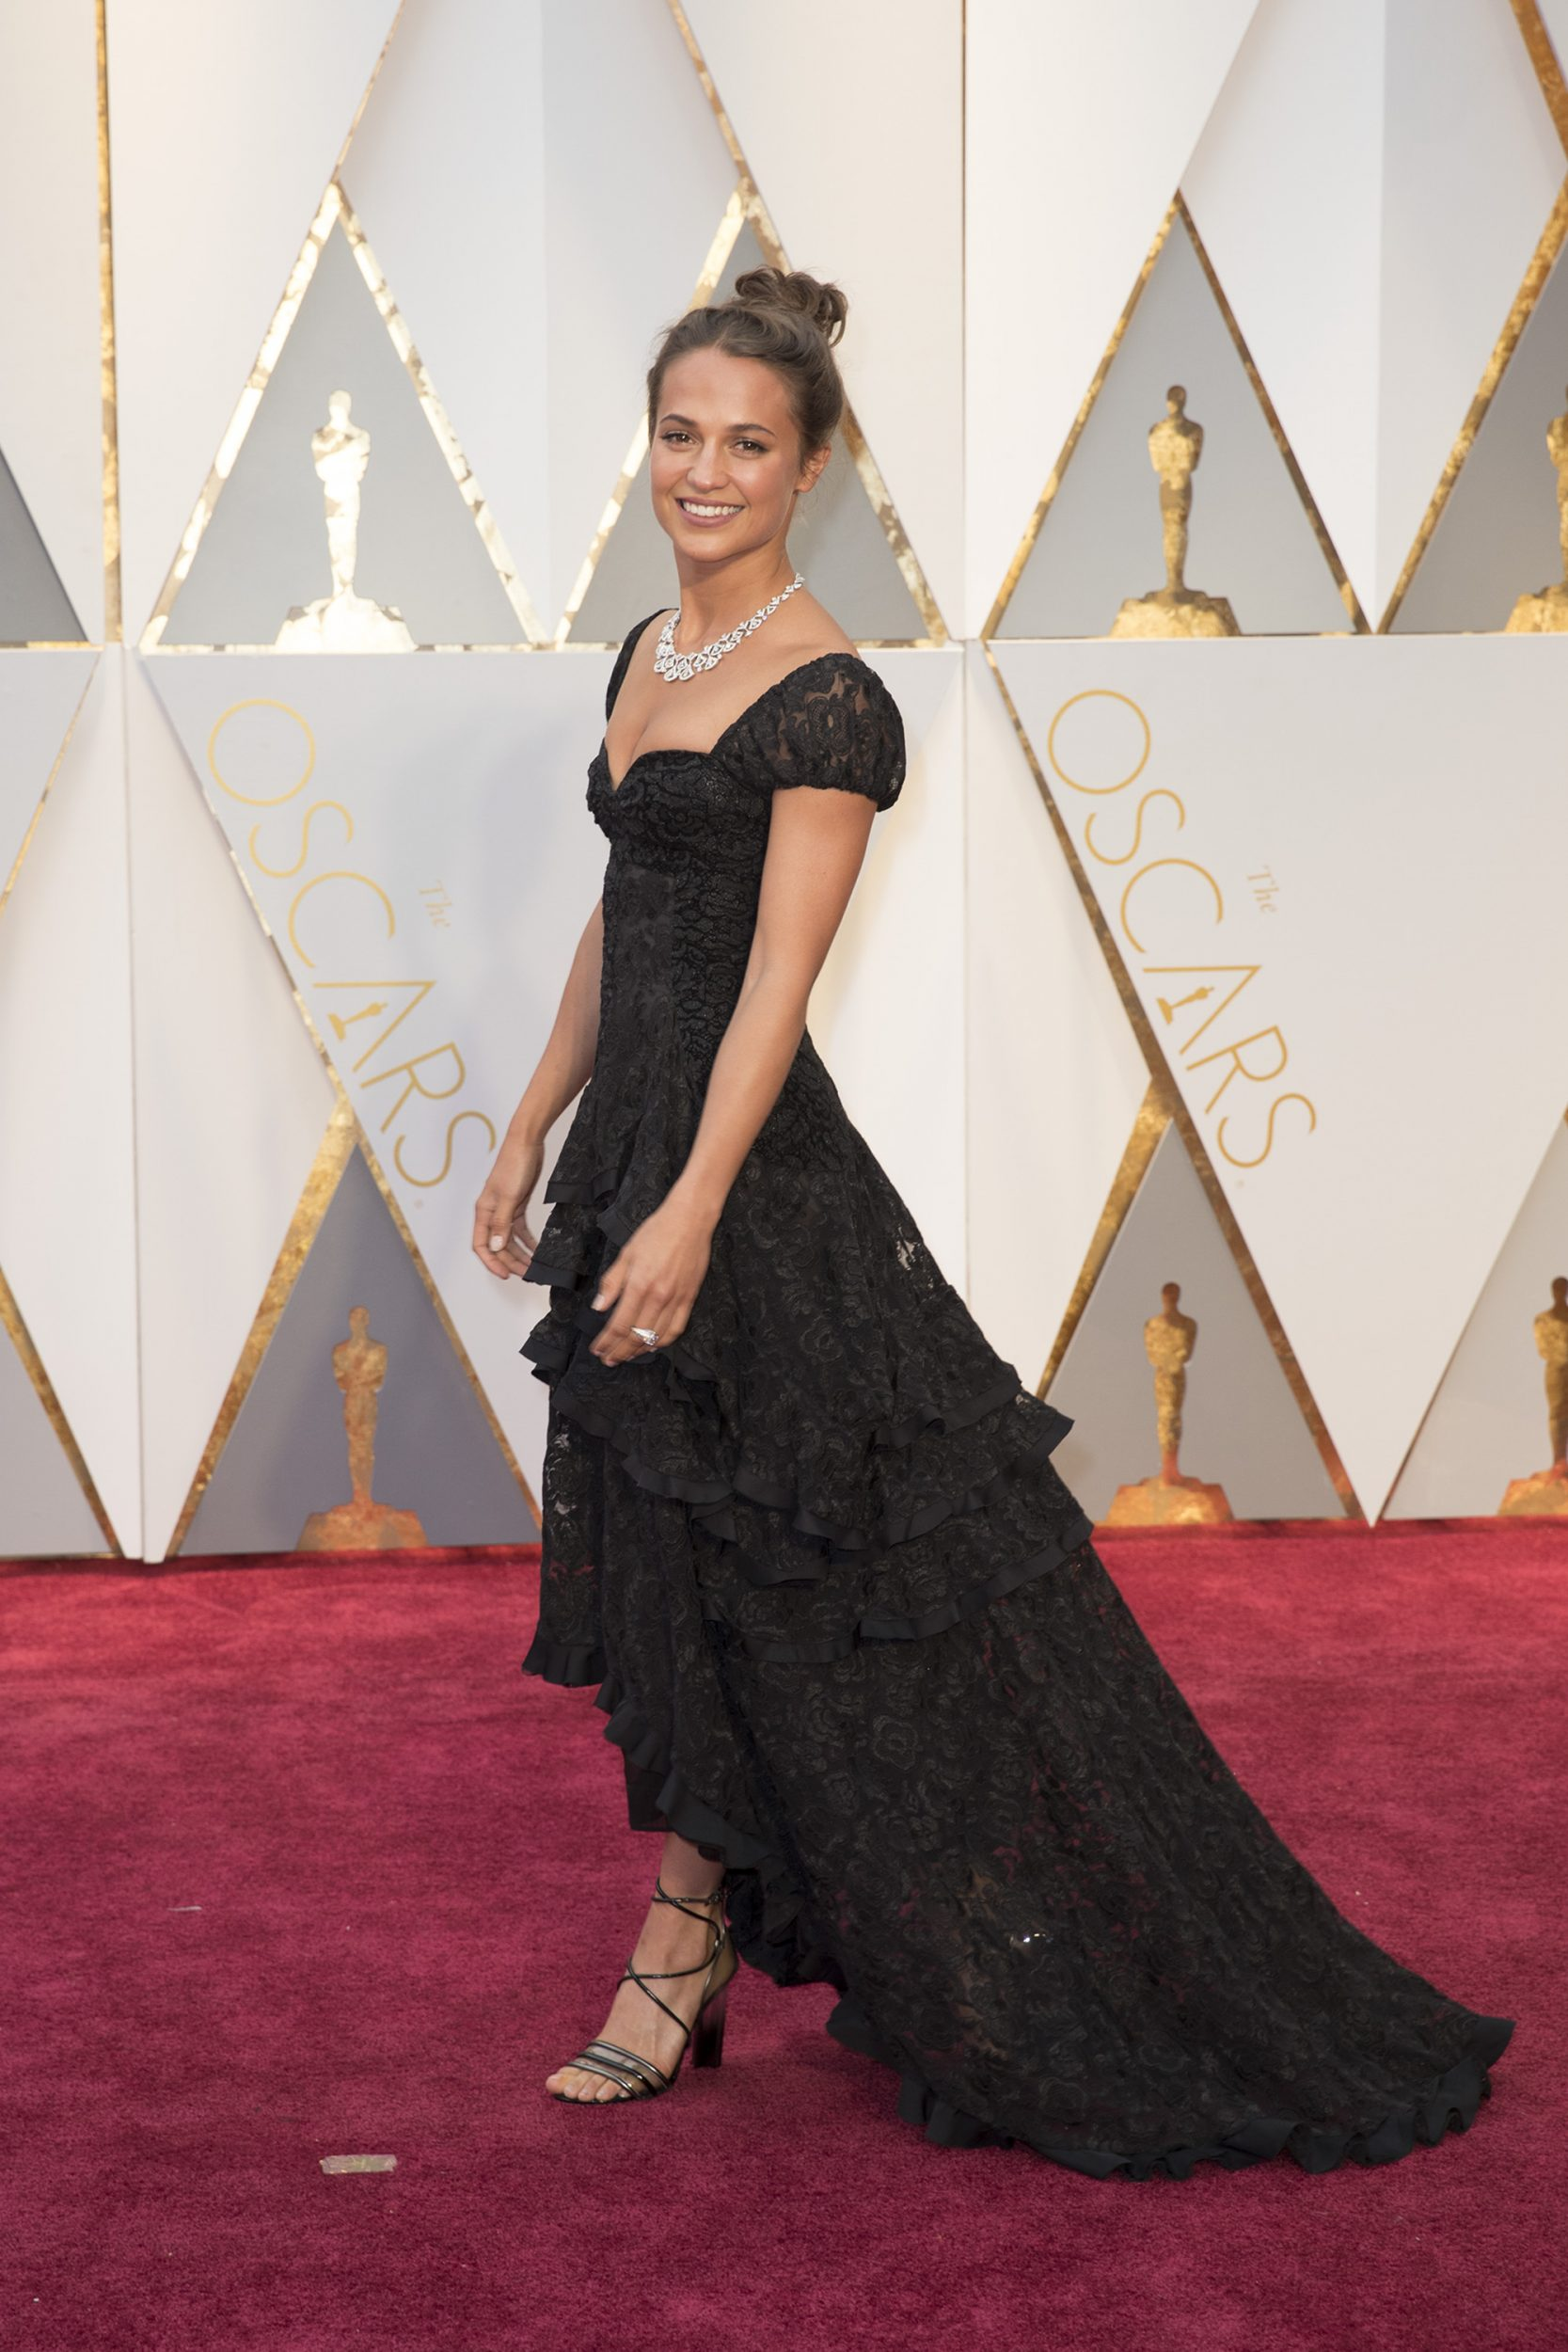 THE OSCARS(r) - The 89th Oscars(r)  broadcasts live on Oscar(r) SUNDAY, FEBRUARY 26, 2017, on the ABC Television Network. (ABC/Tyler Golden) ALICIA VIKANDER